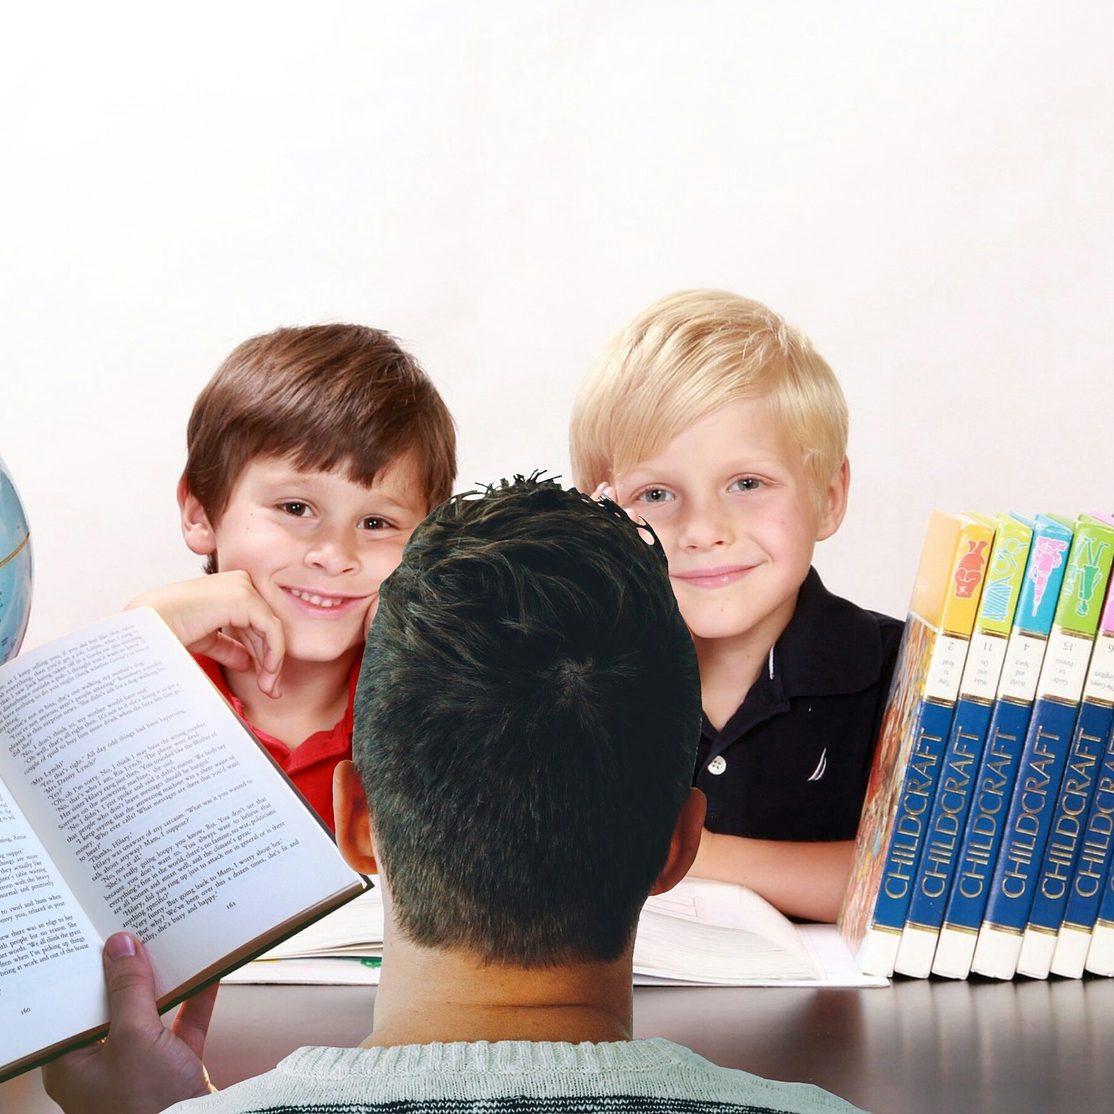 teacher-3802135_1920